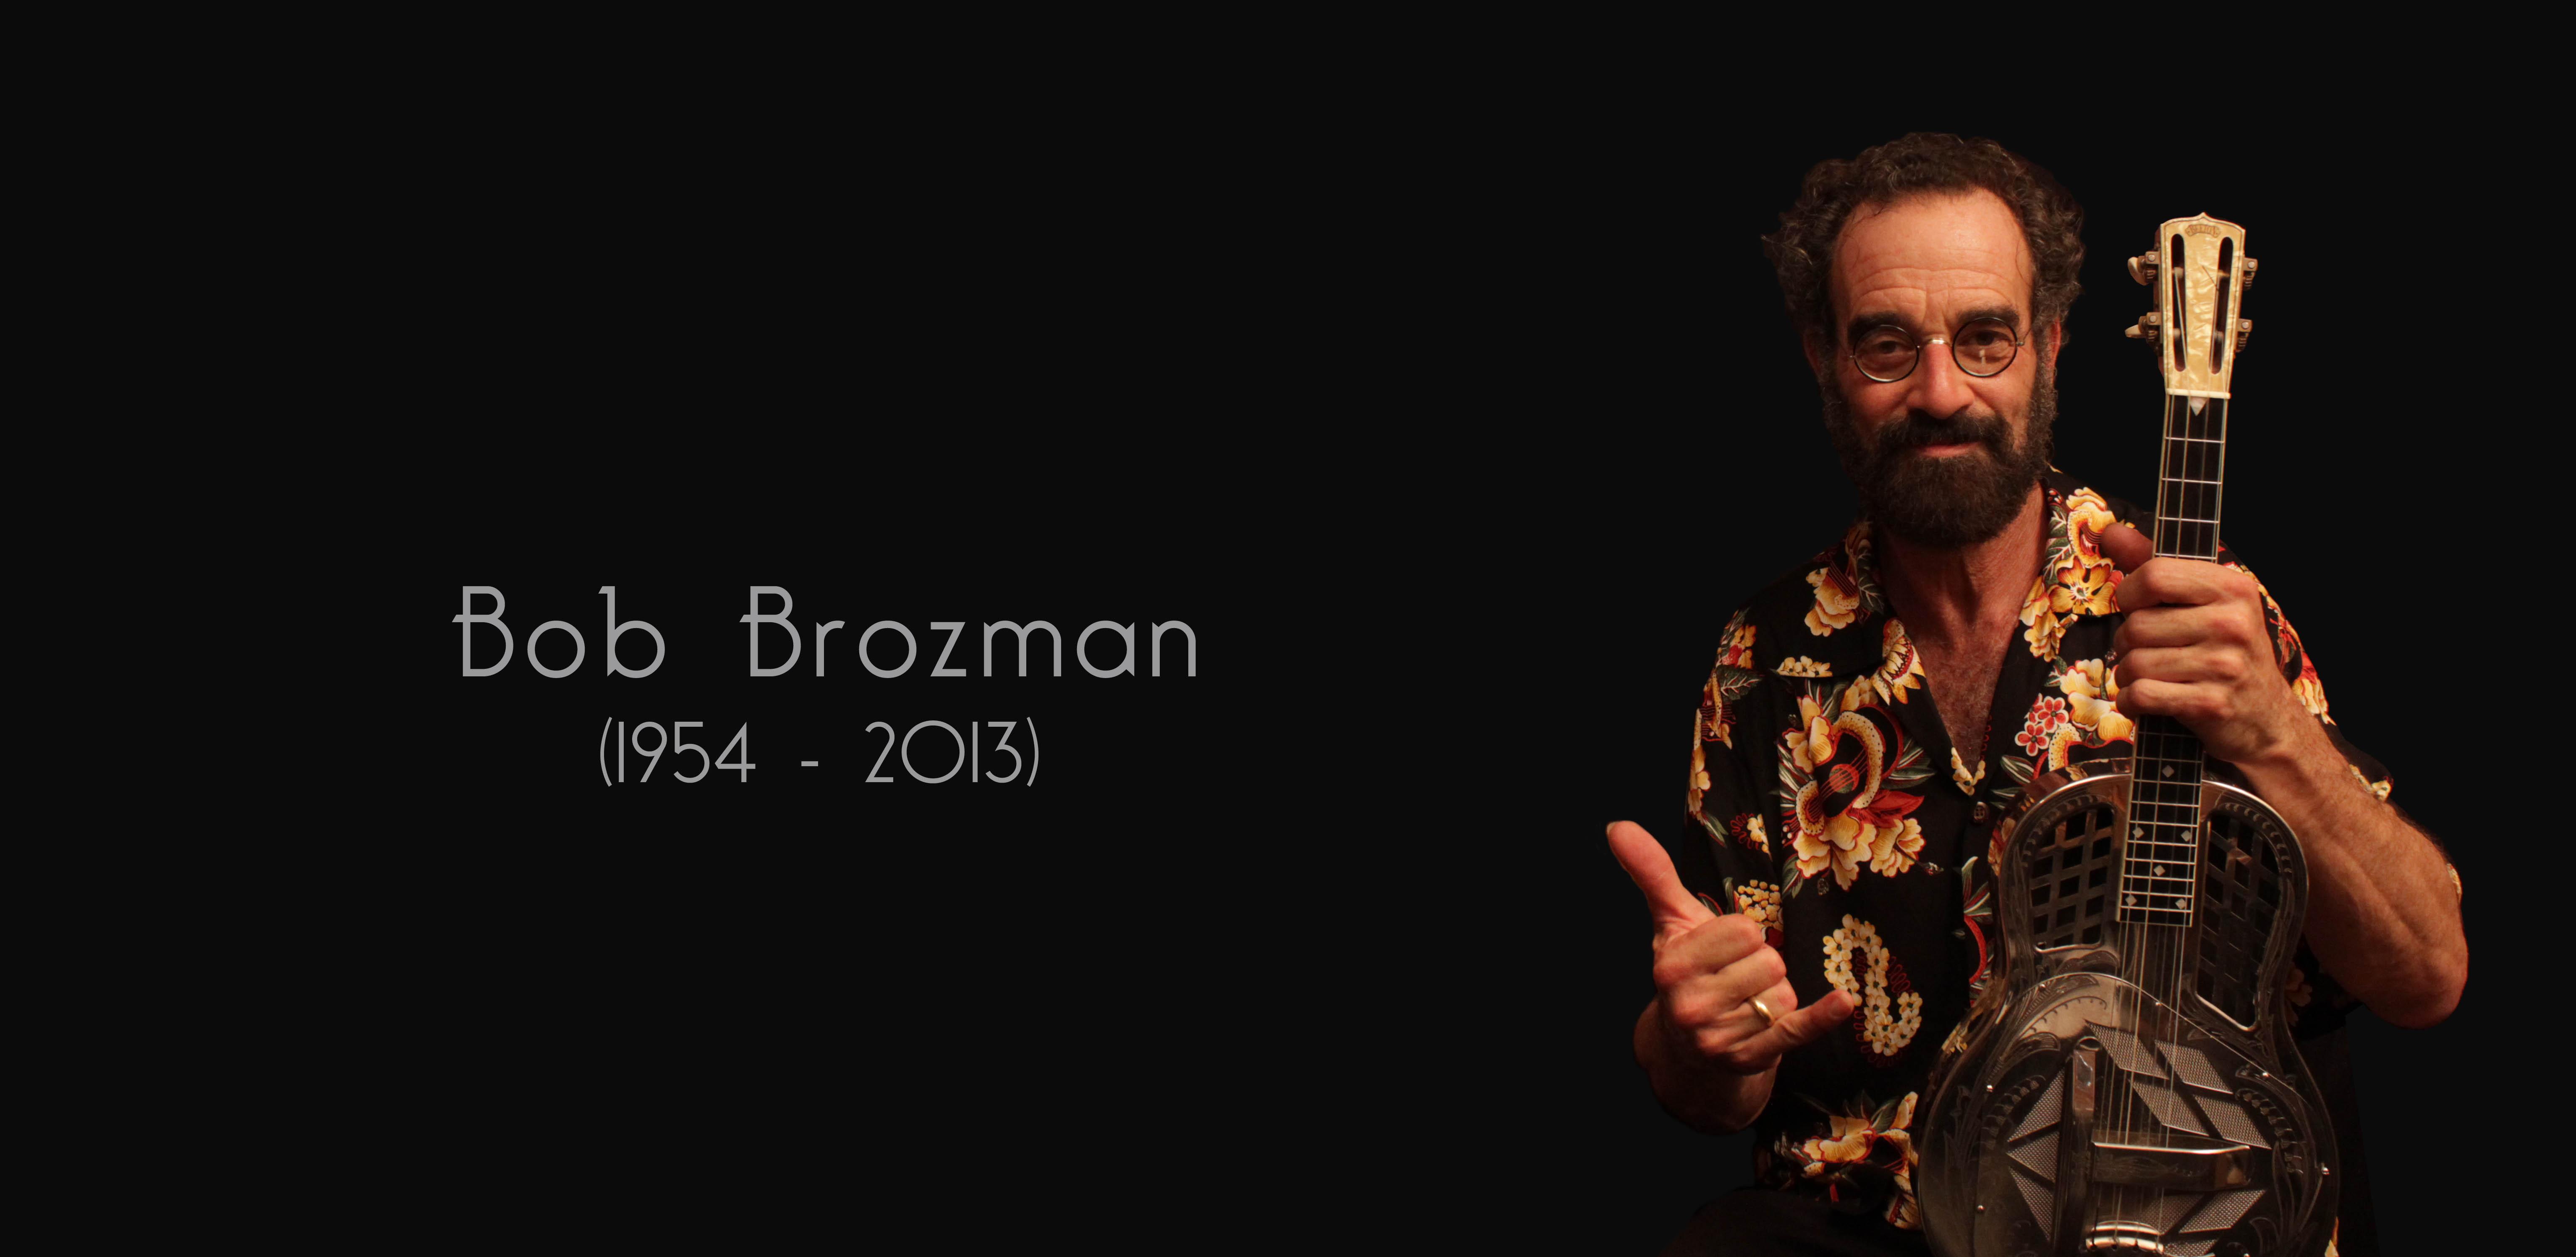 http://www.ukulele.fr/wp-content/uploads/2013/04/Bob_Brozman_1954_2013.jpg